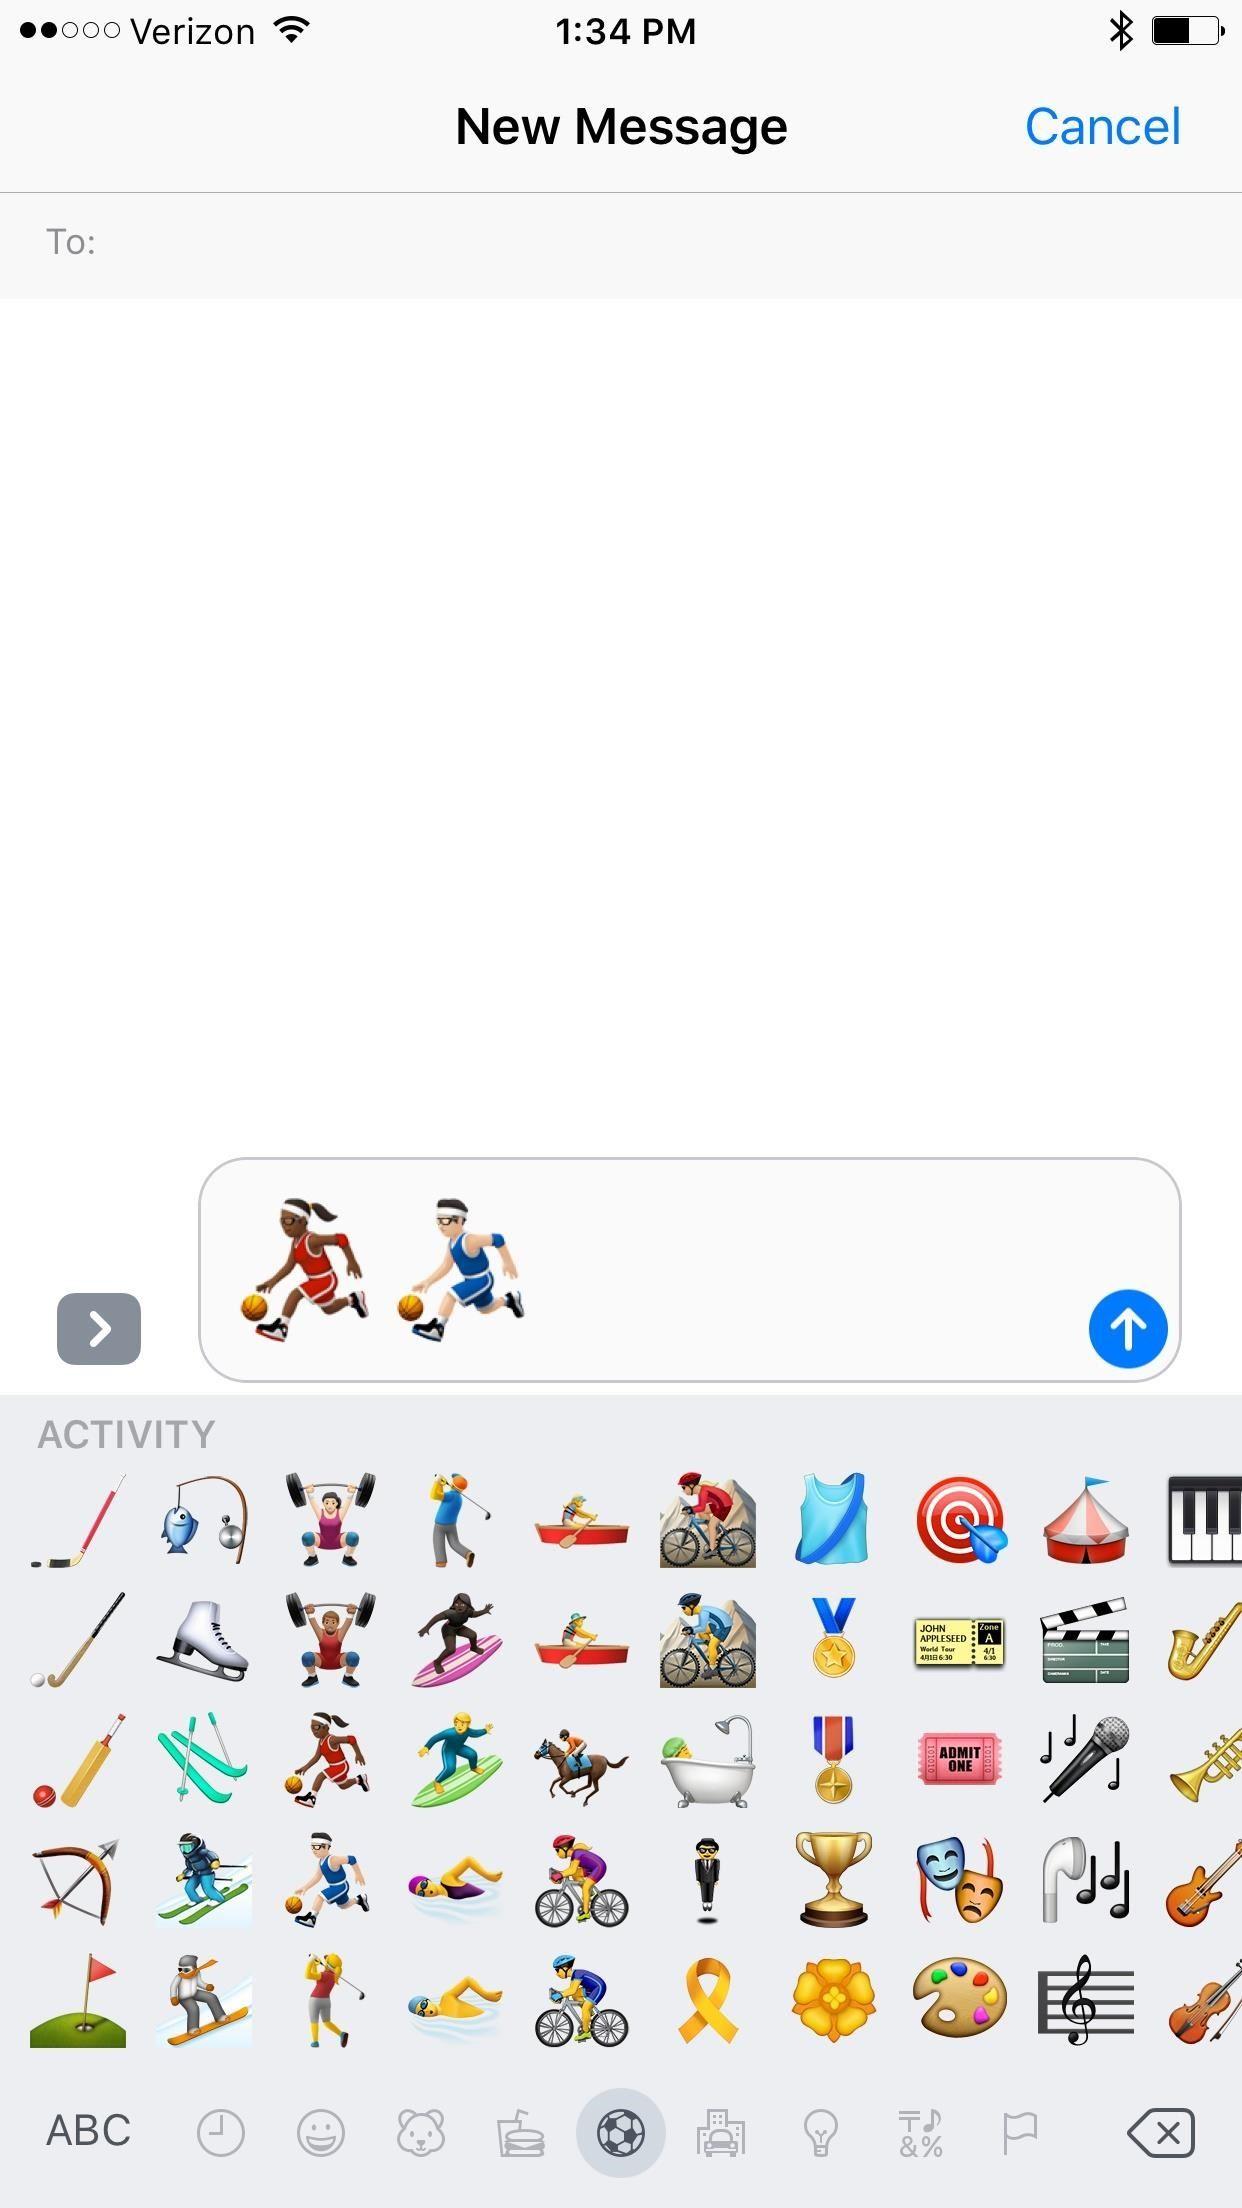 Apple's Latest iOS 10 Beta 4 Adds Emojis & More